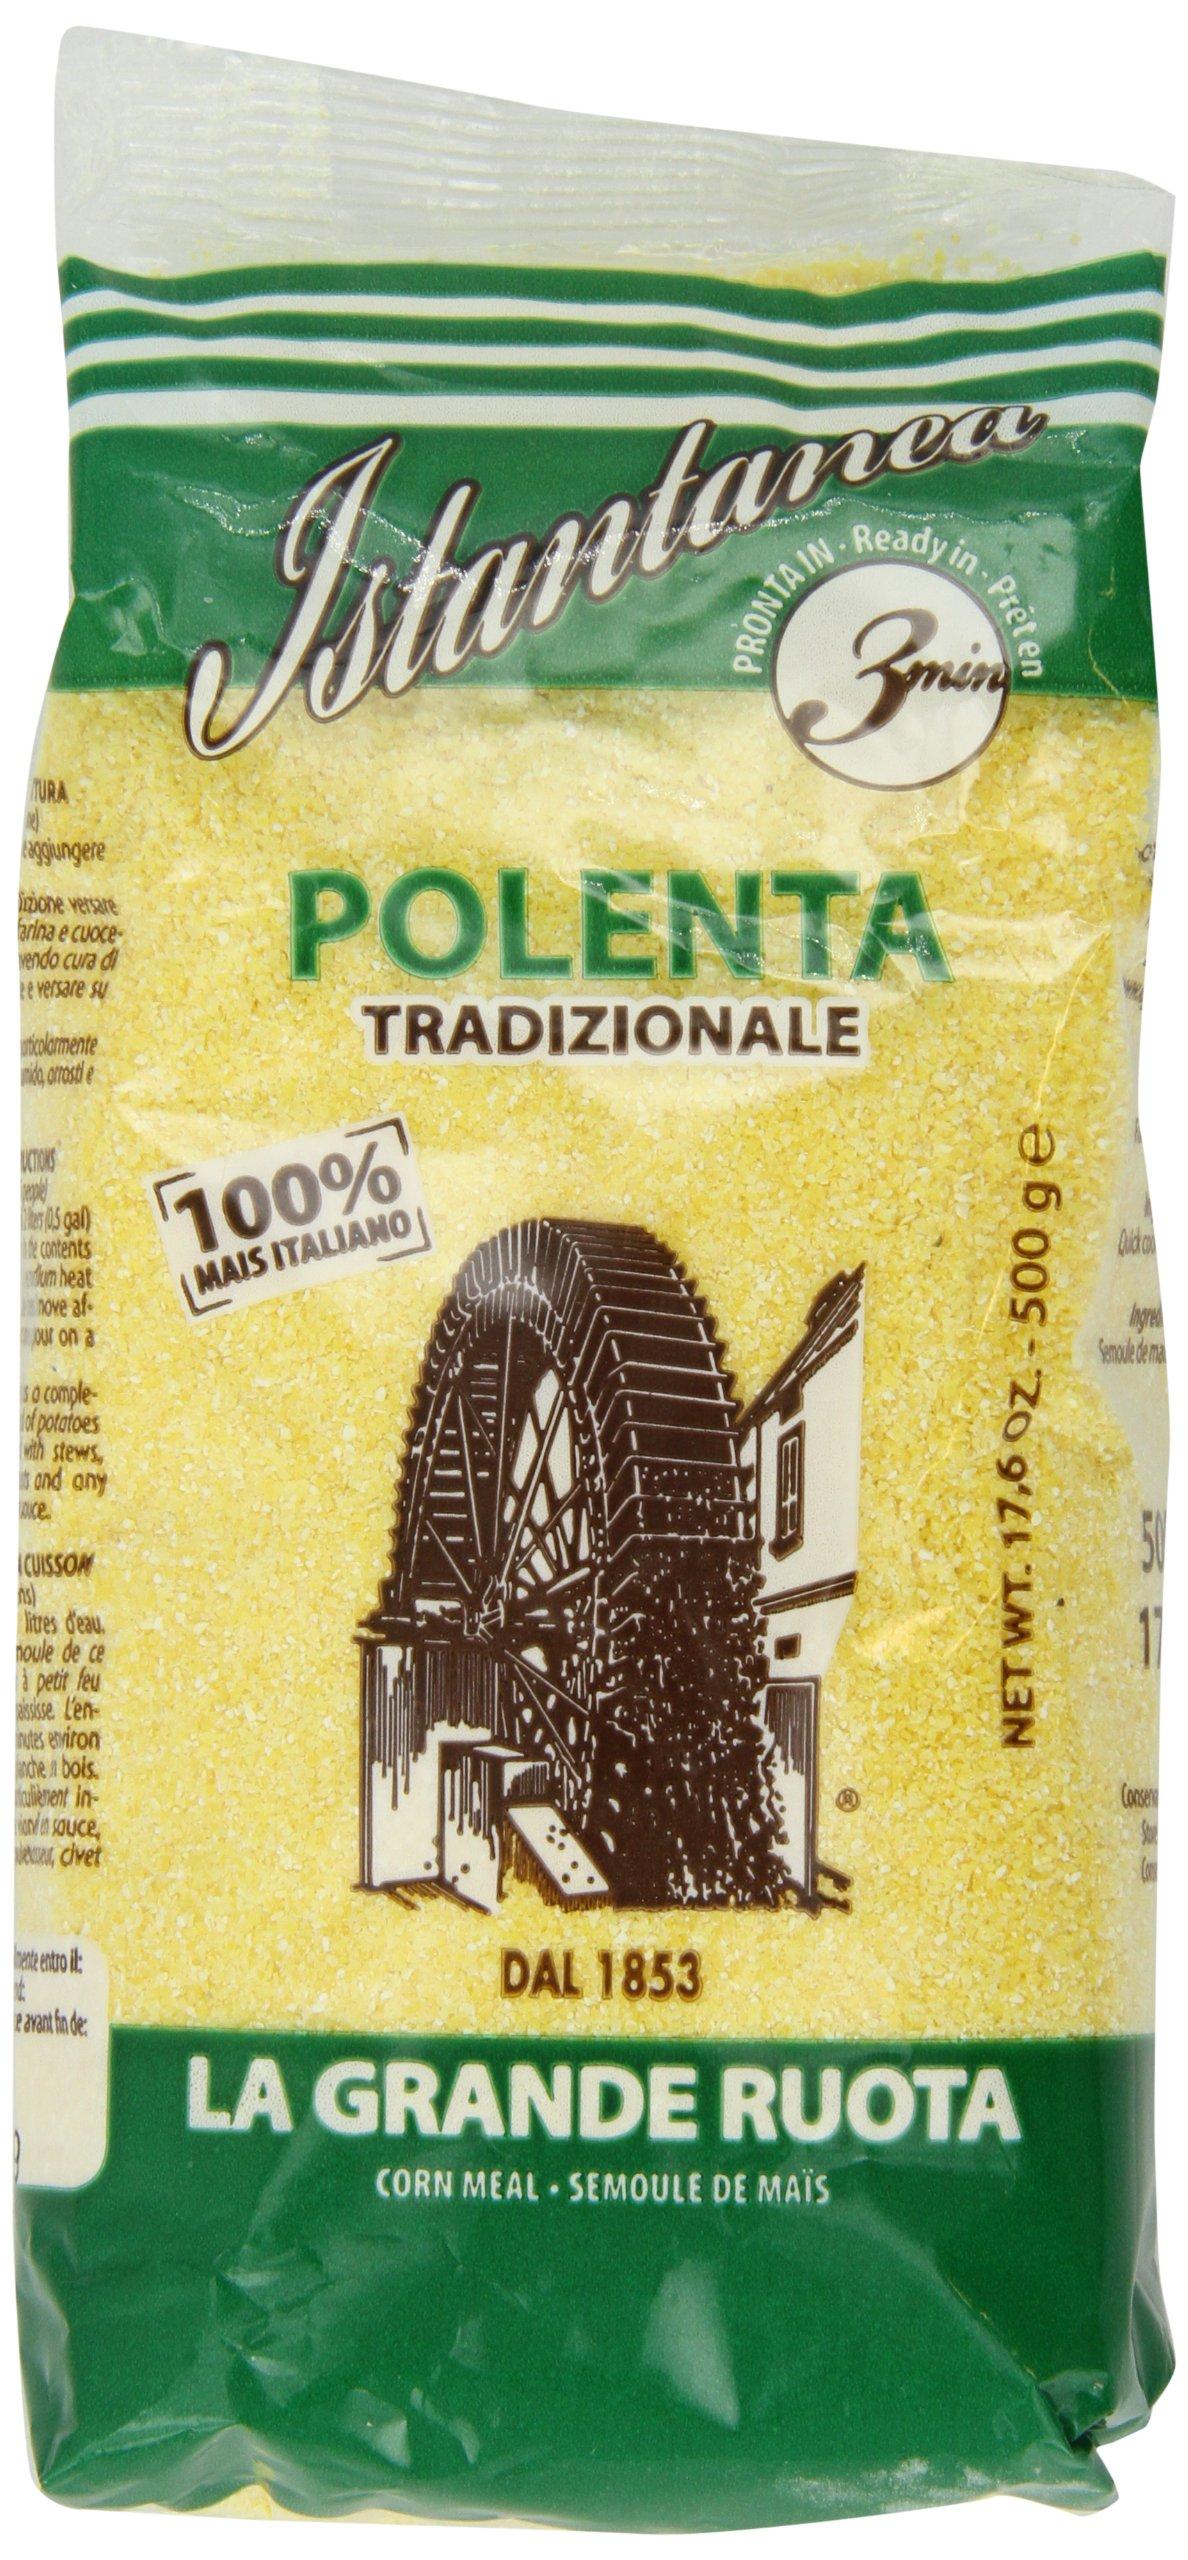 La Grande Ruota Istantanea Polenta Tradizionale, 3 Minute Quick Cooking, 17.6-Ounce (Pack of 5)